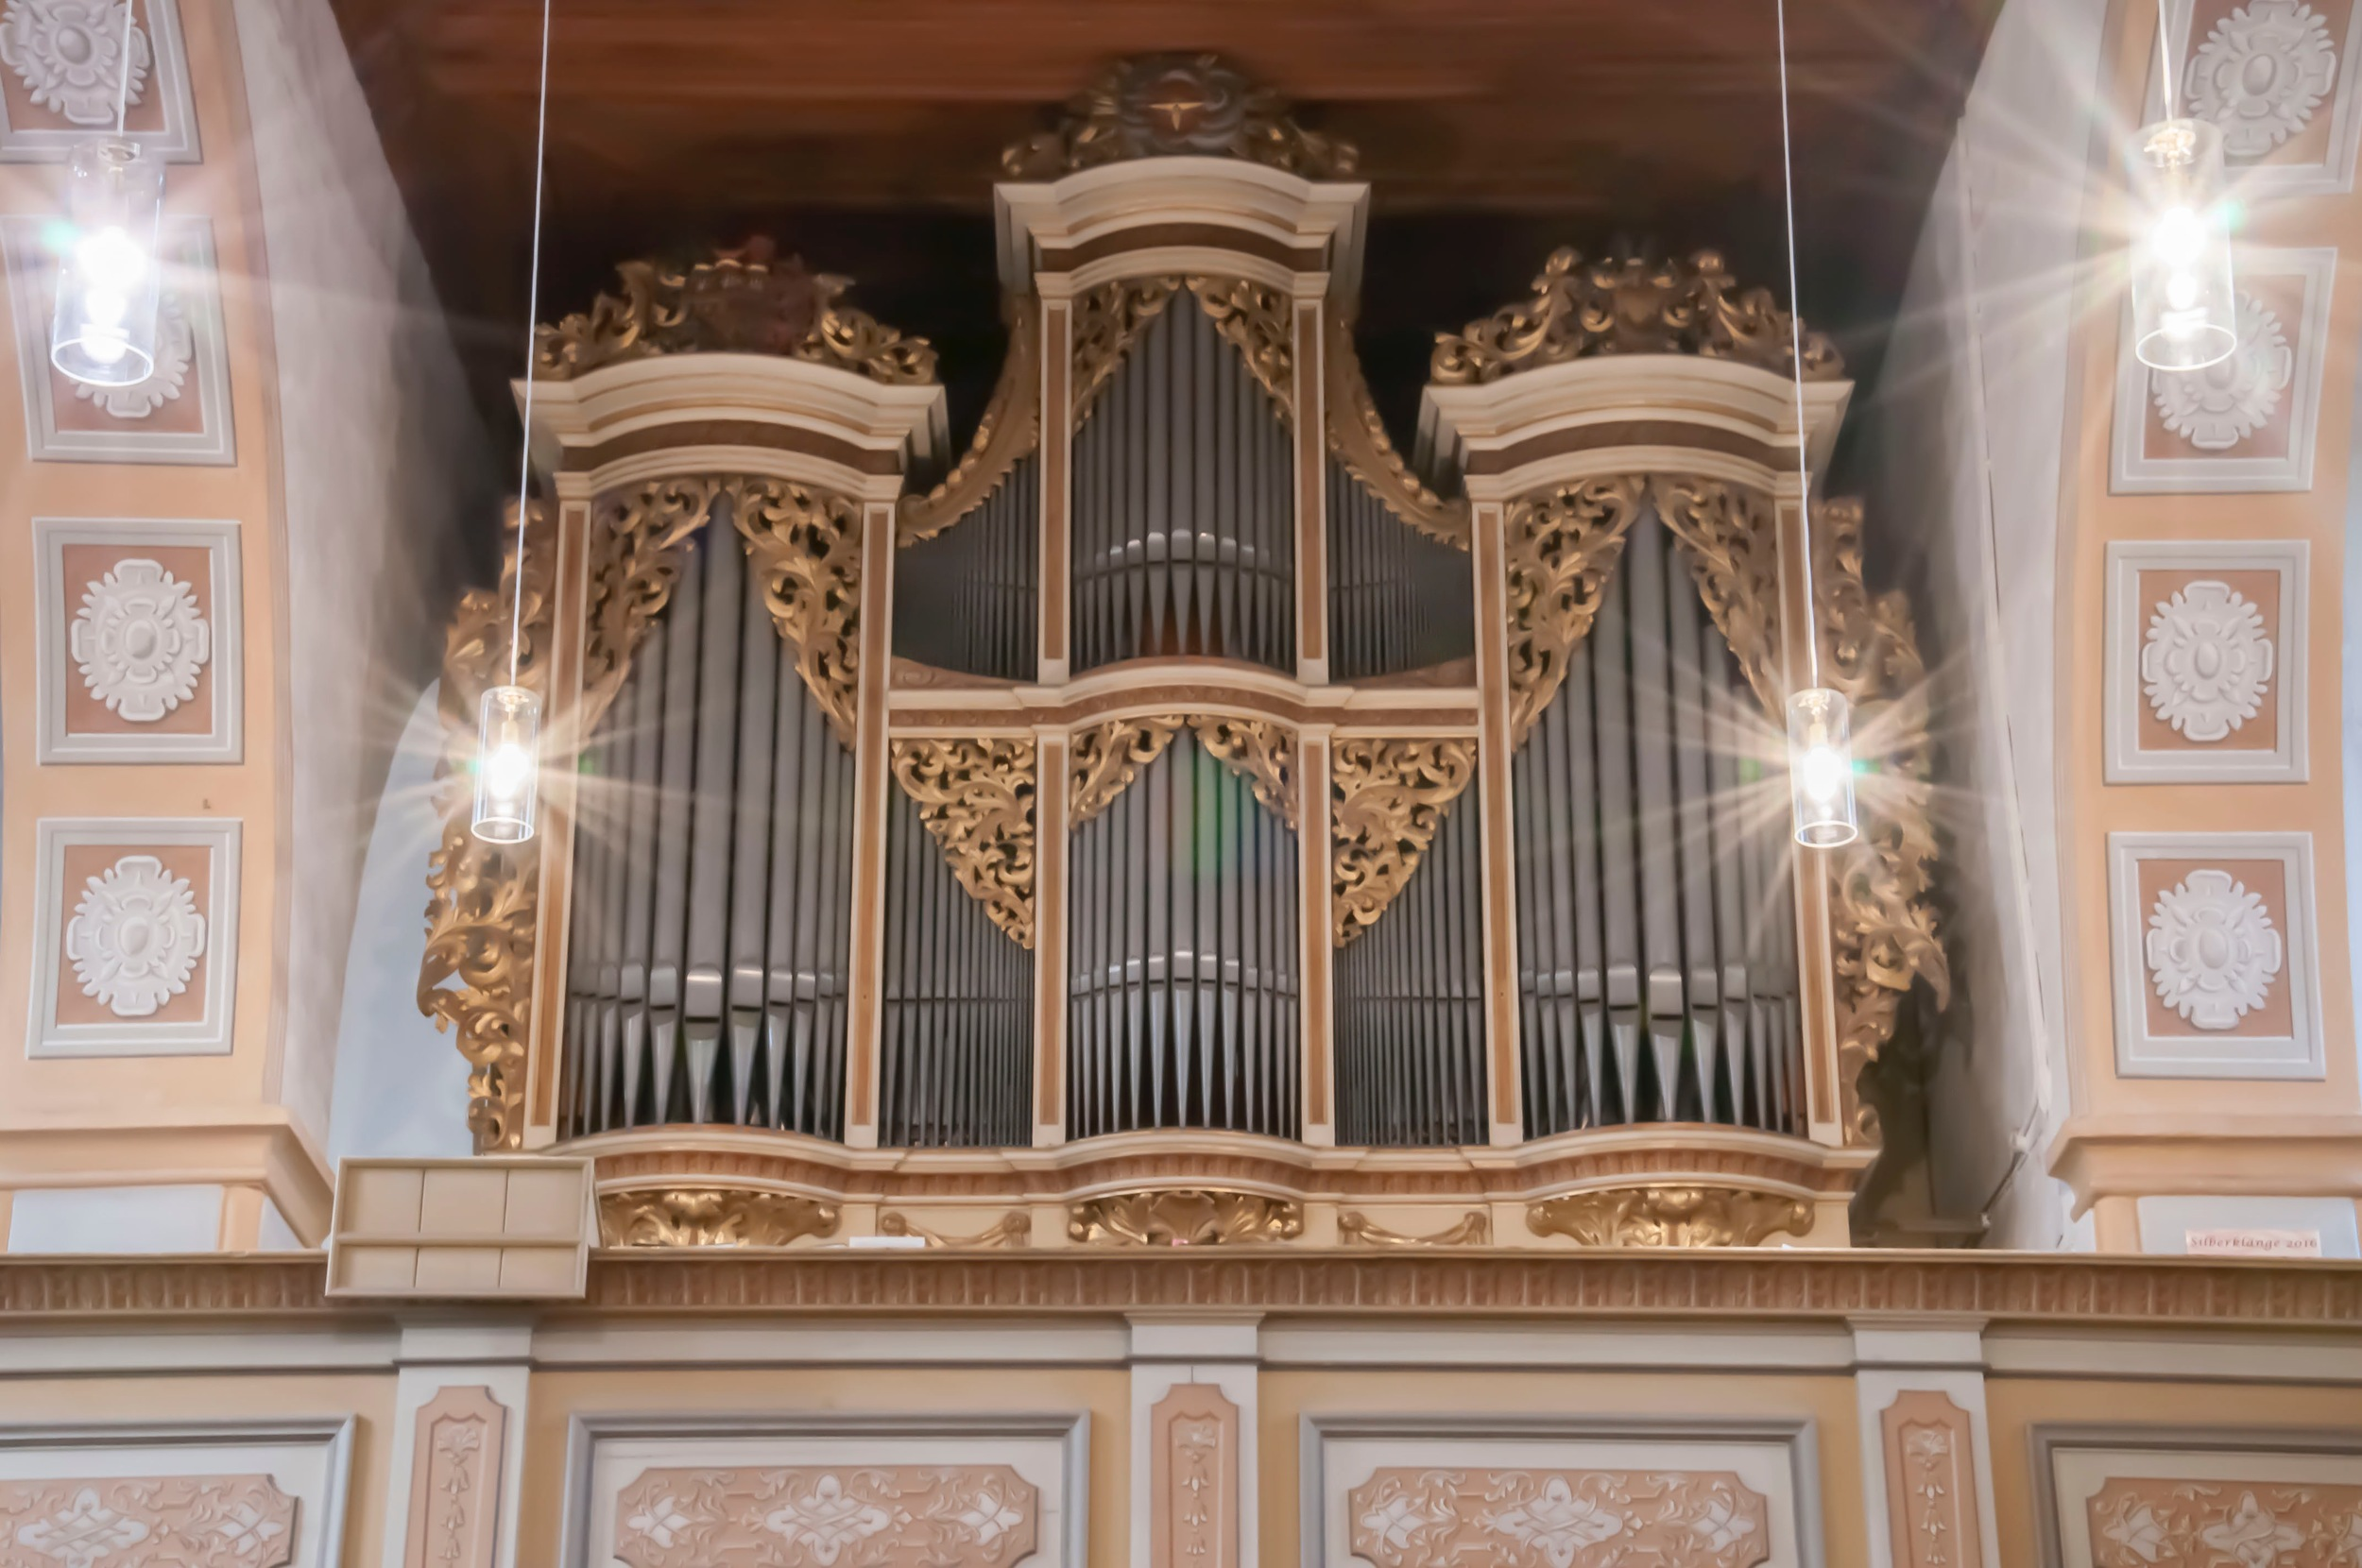 One of the Silbermann organs in Rötha